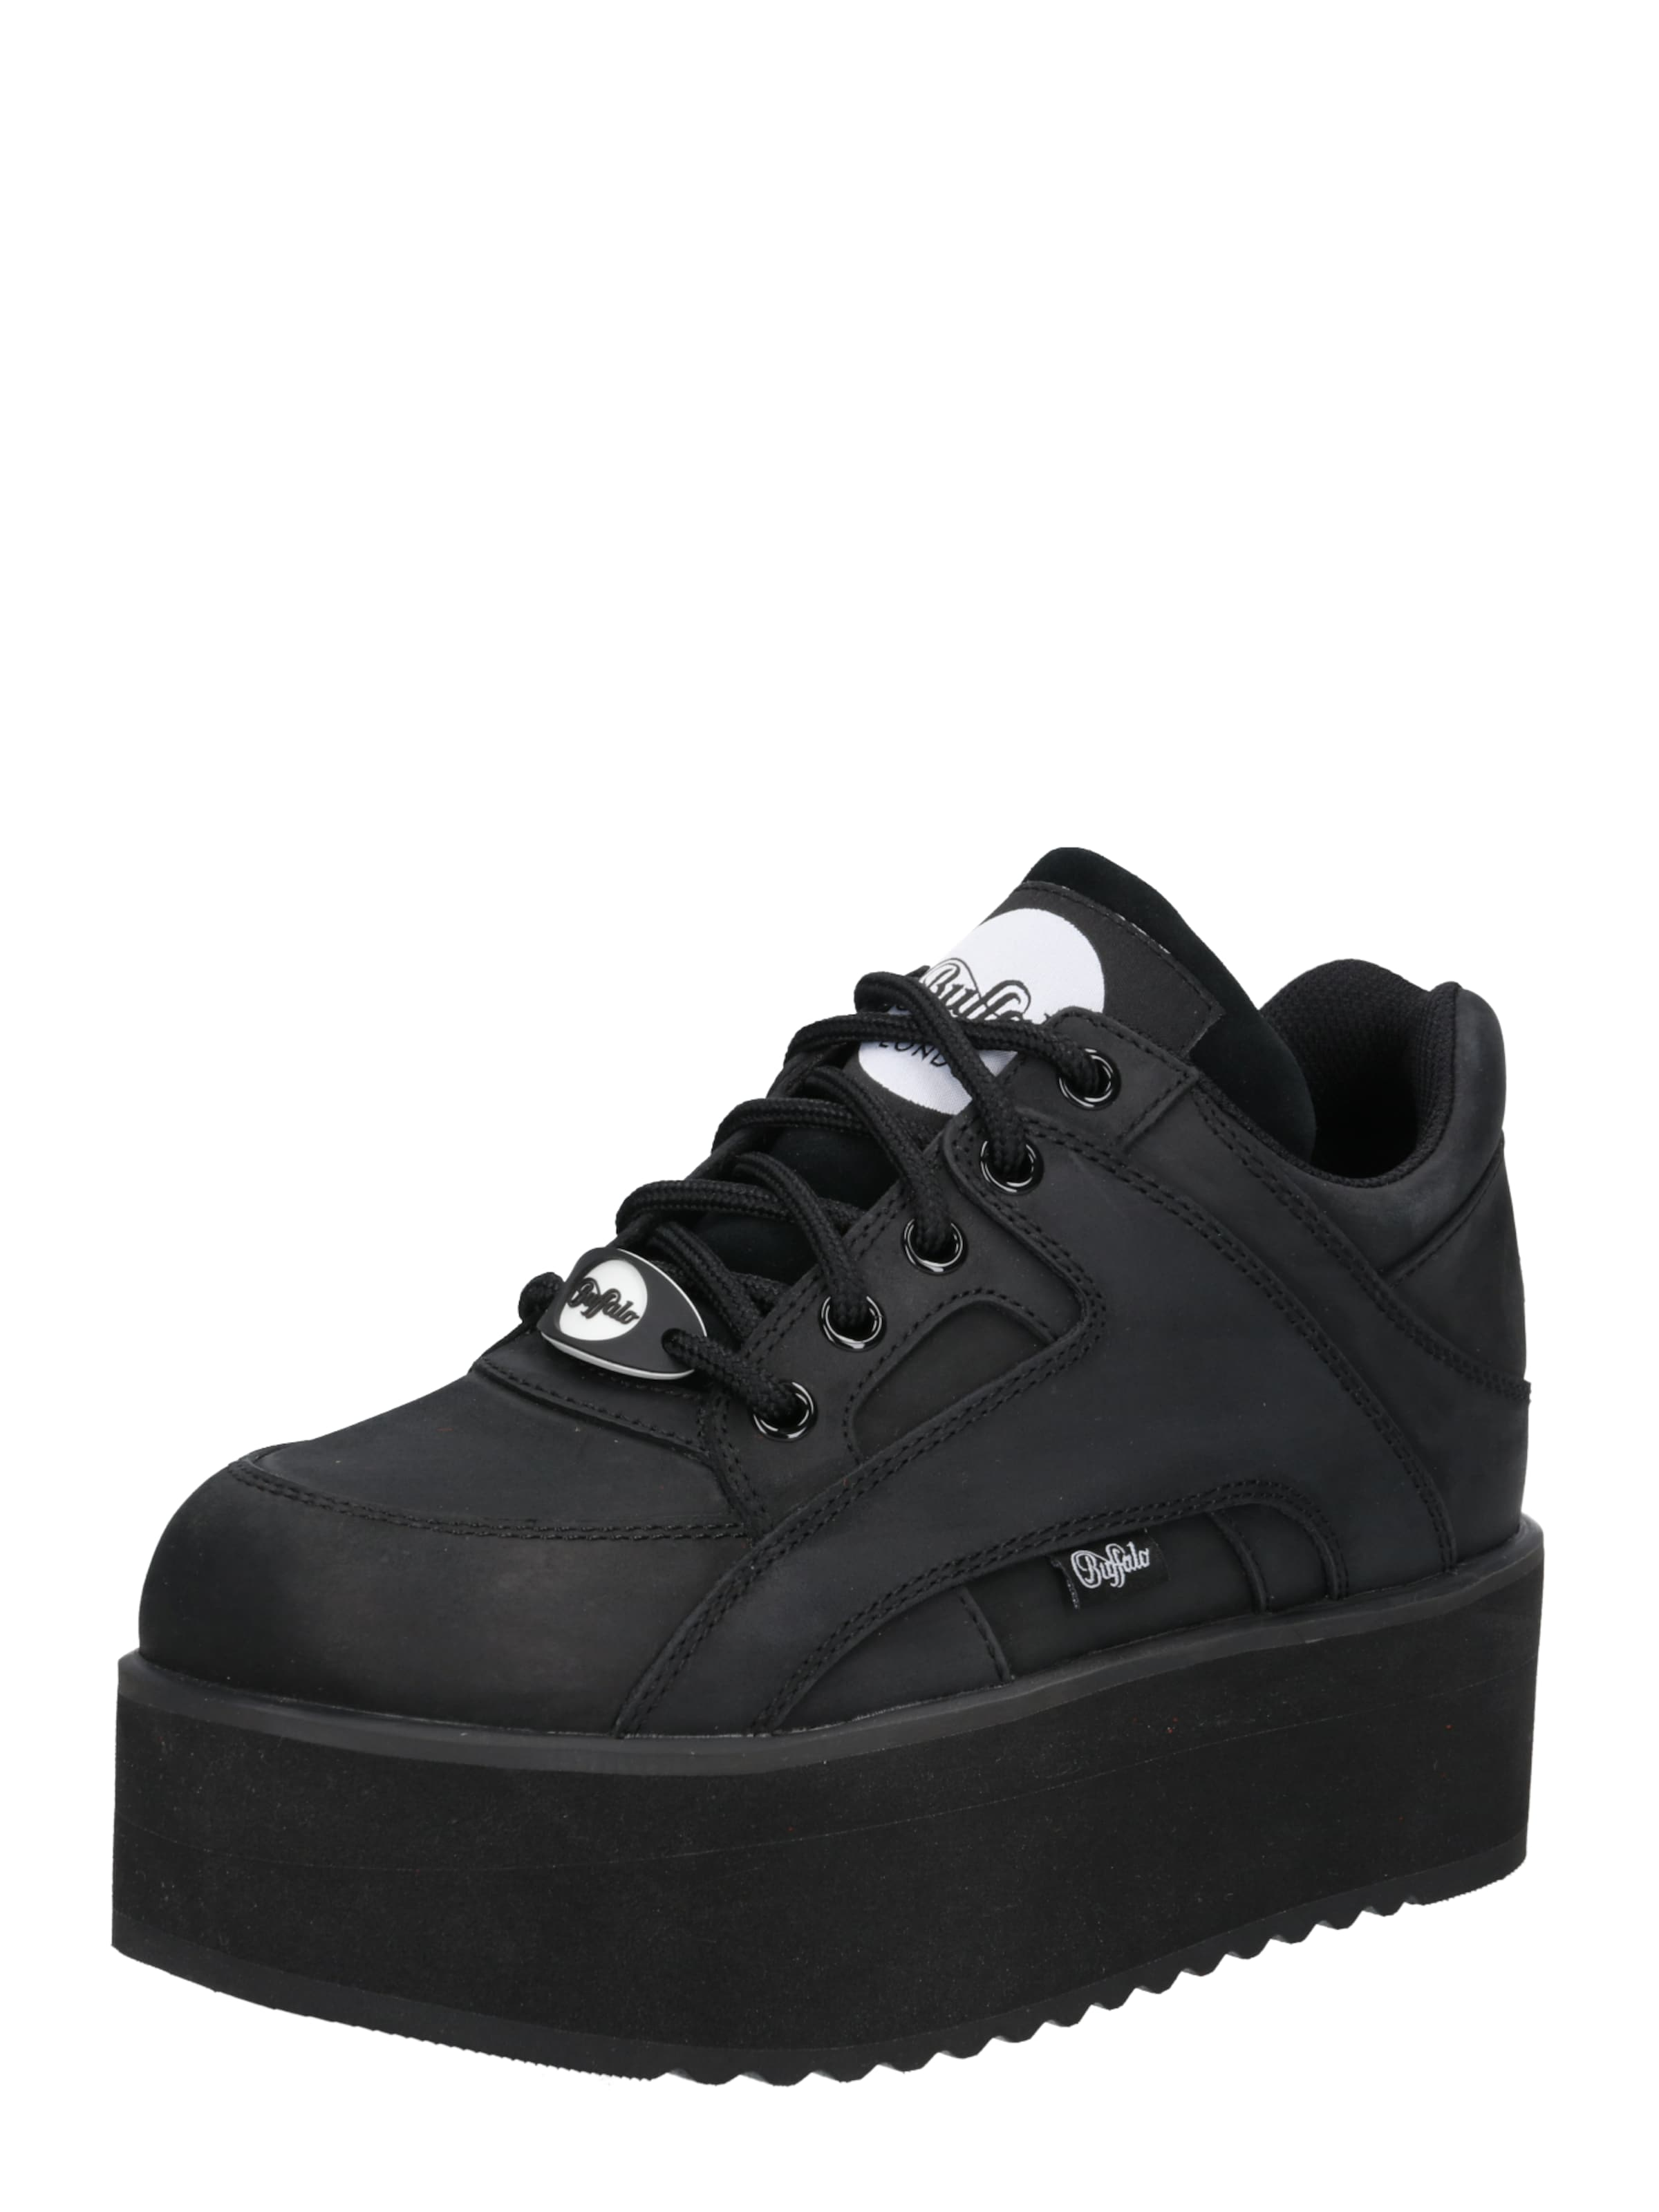 London Buffalo '1130 6' DamenSneaker In Schwarz QWdCBoerxE